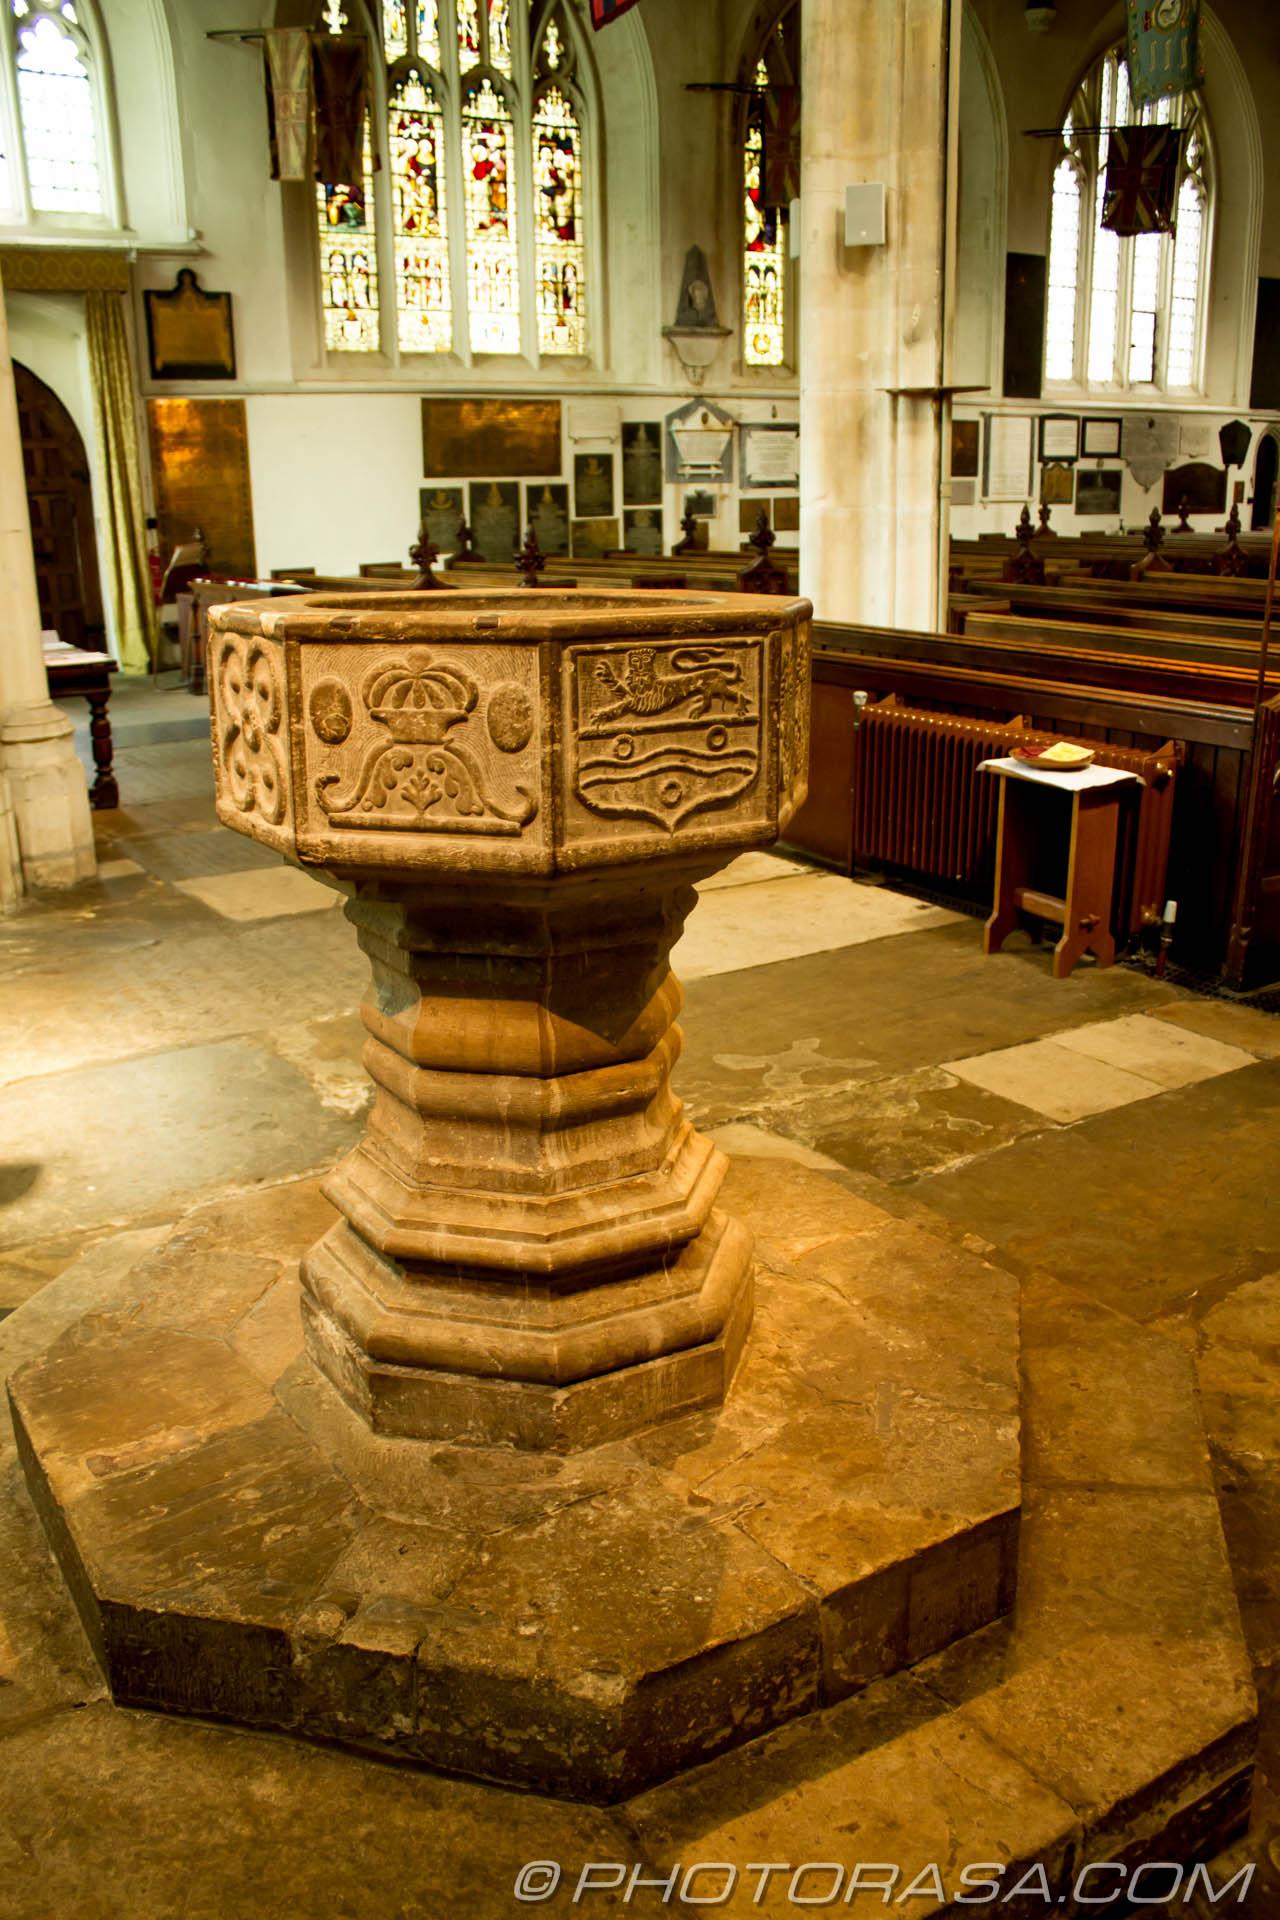 https://photorasa.com/inside-all-saints-church-in-maidstone/all-saints-maidstone-font/